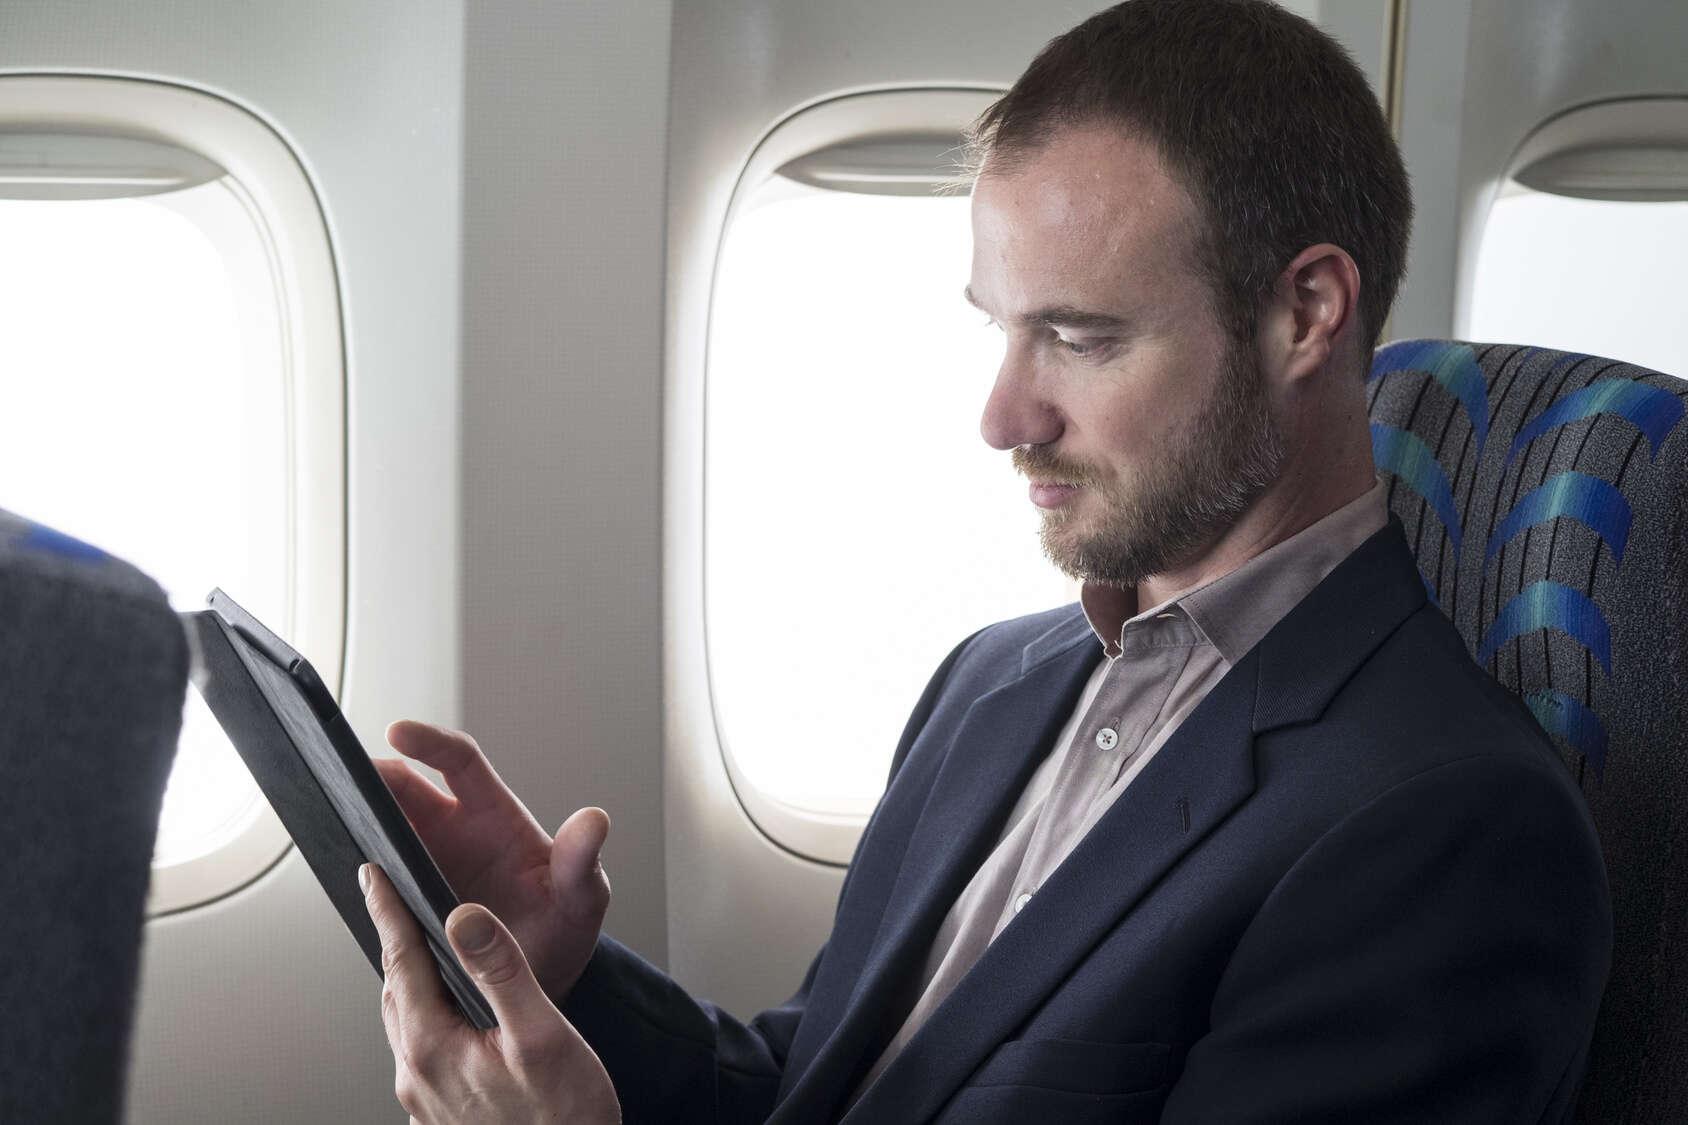 Trends in InFlight Entertainment: Delta's Media Streaming